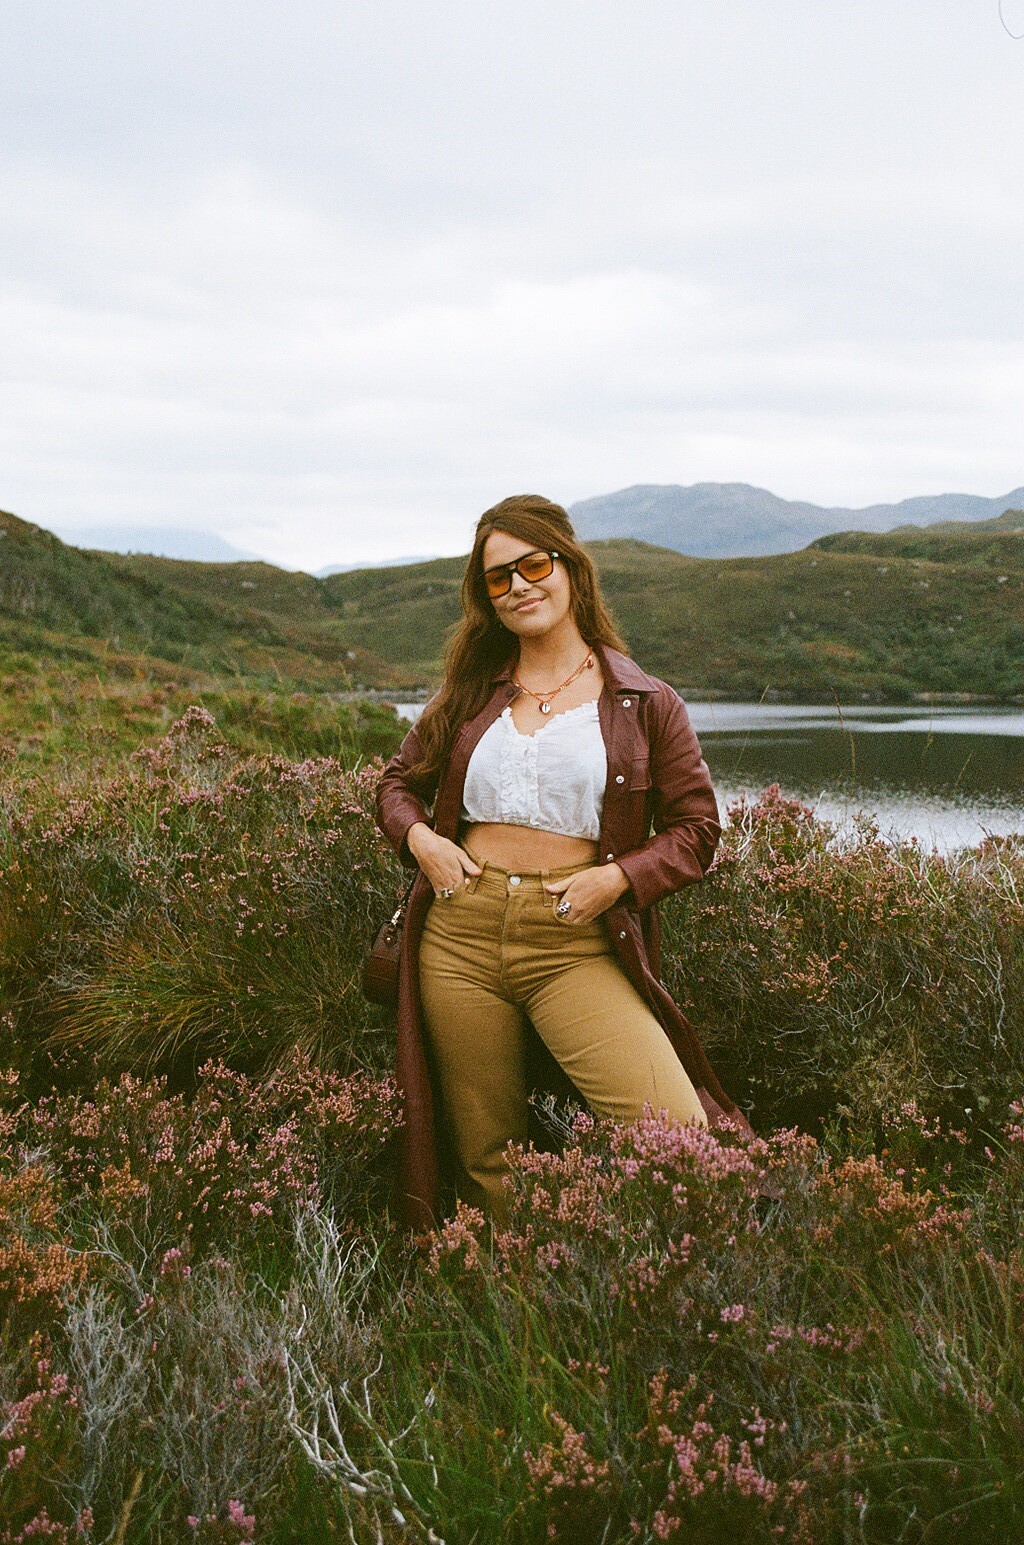 The Little Magpie Scotland Photo Diary North Coast 500 14